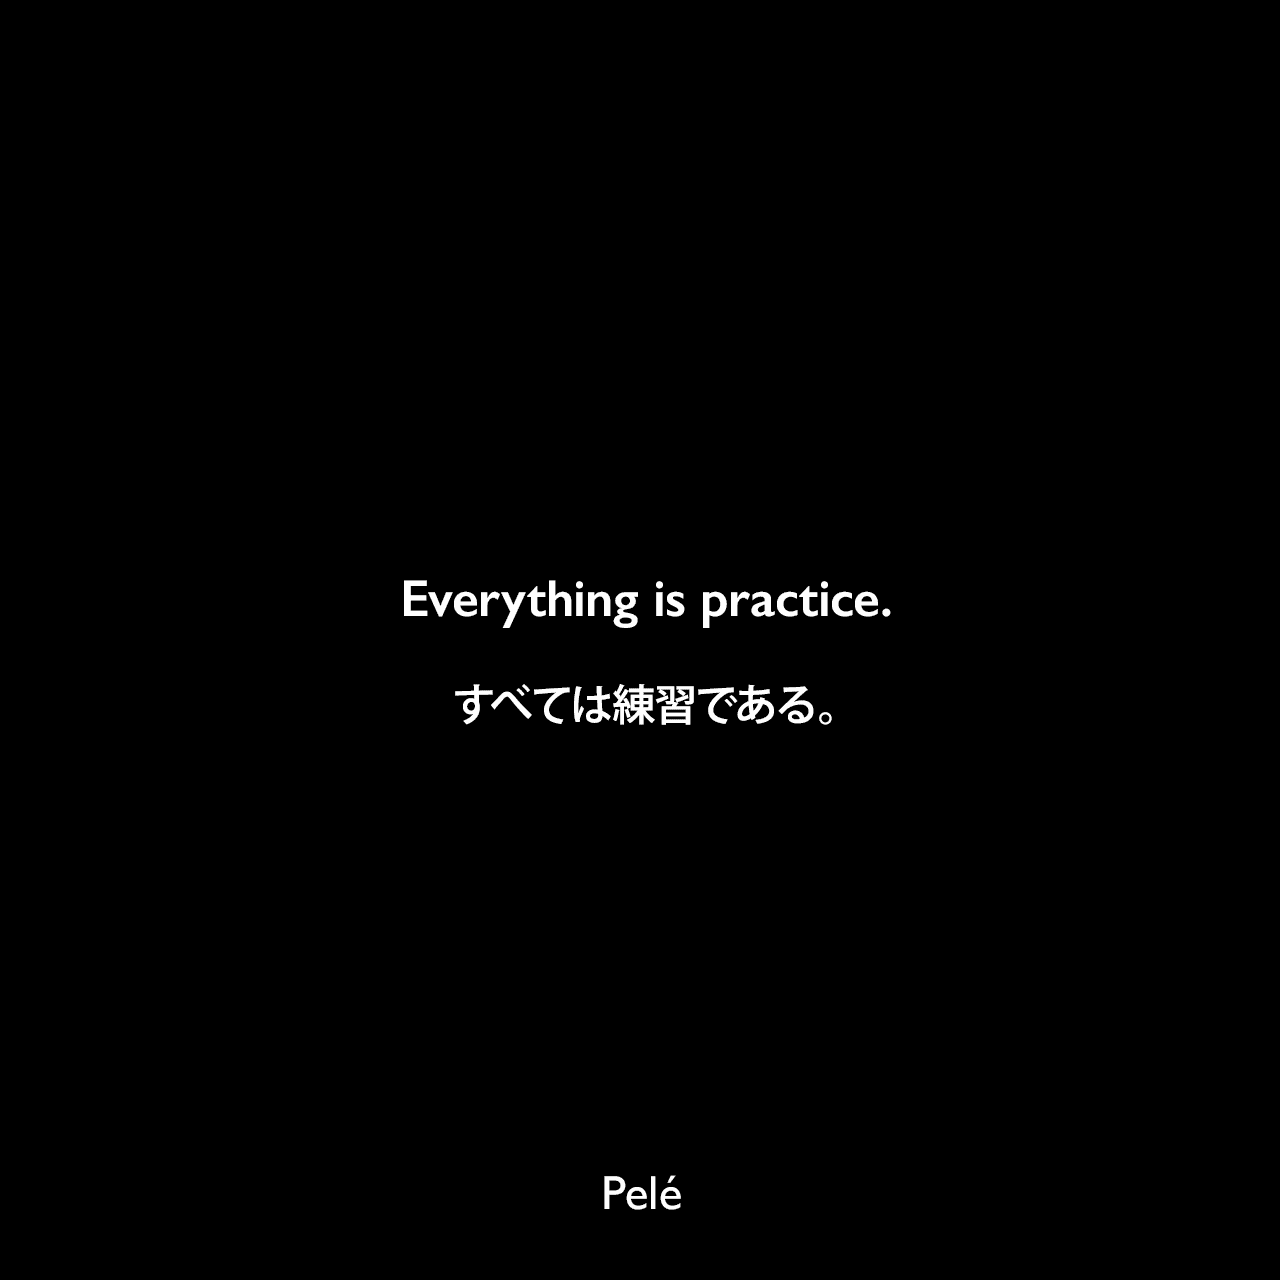 Everything is practice.すべては練習である。